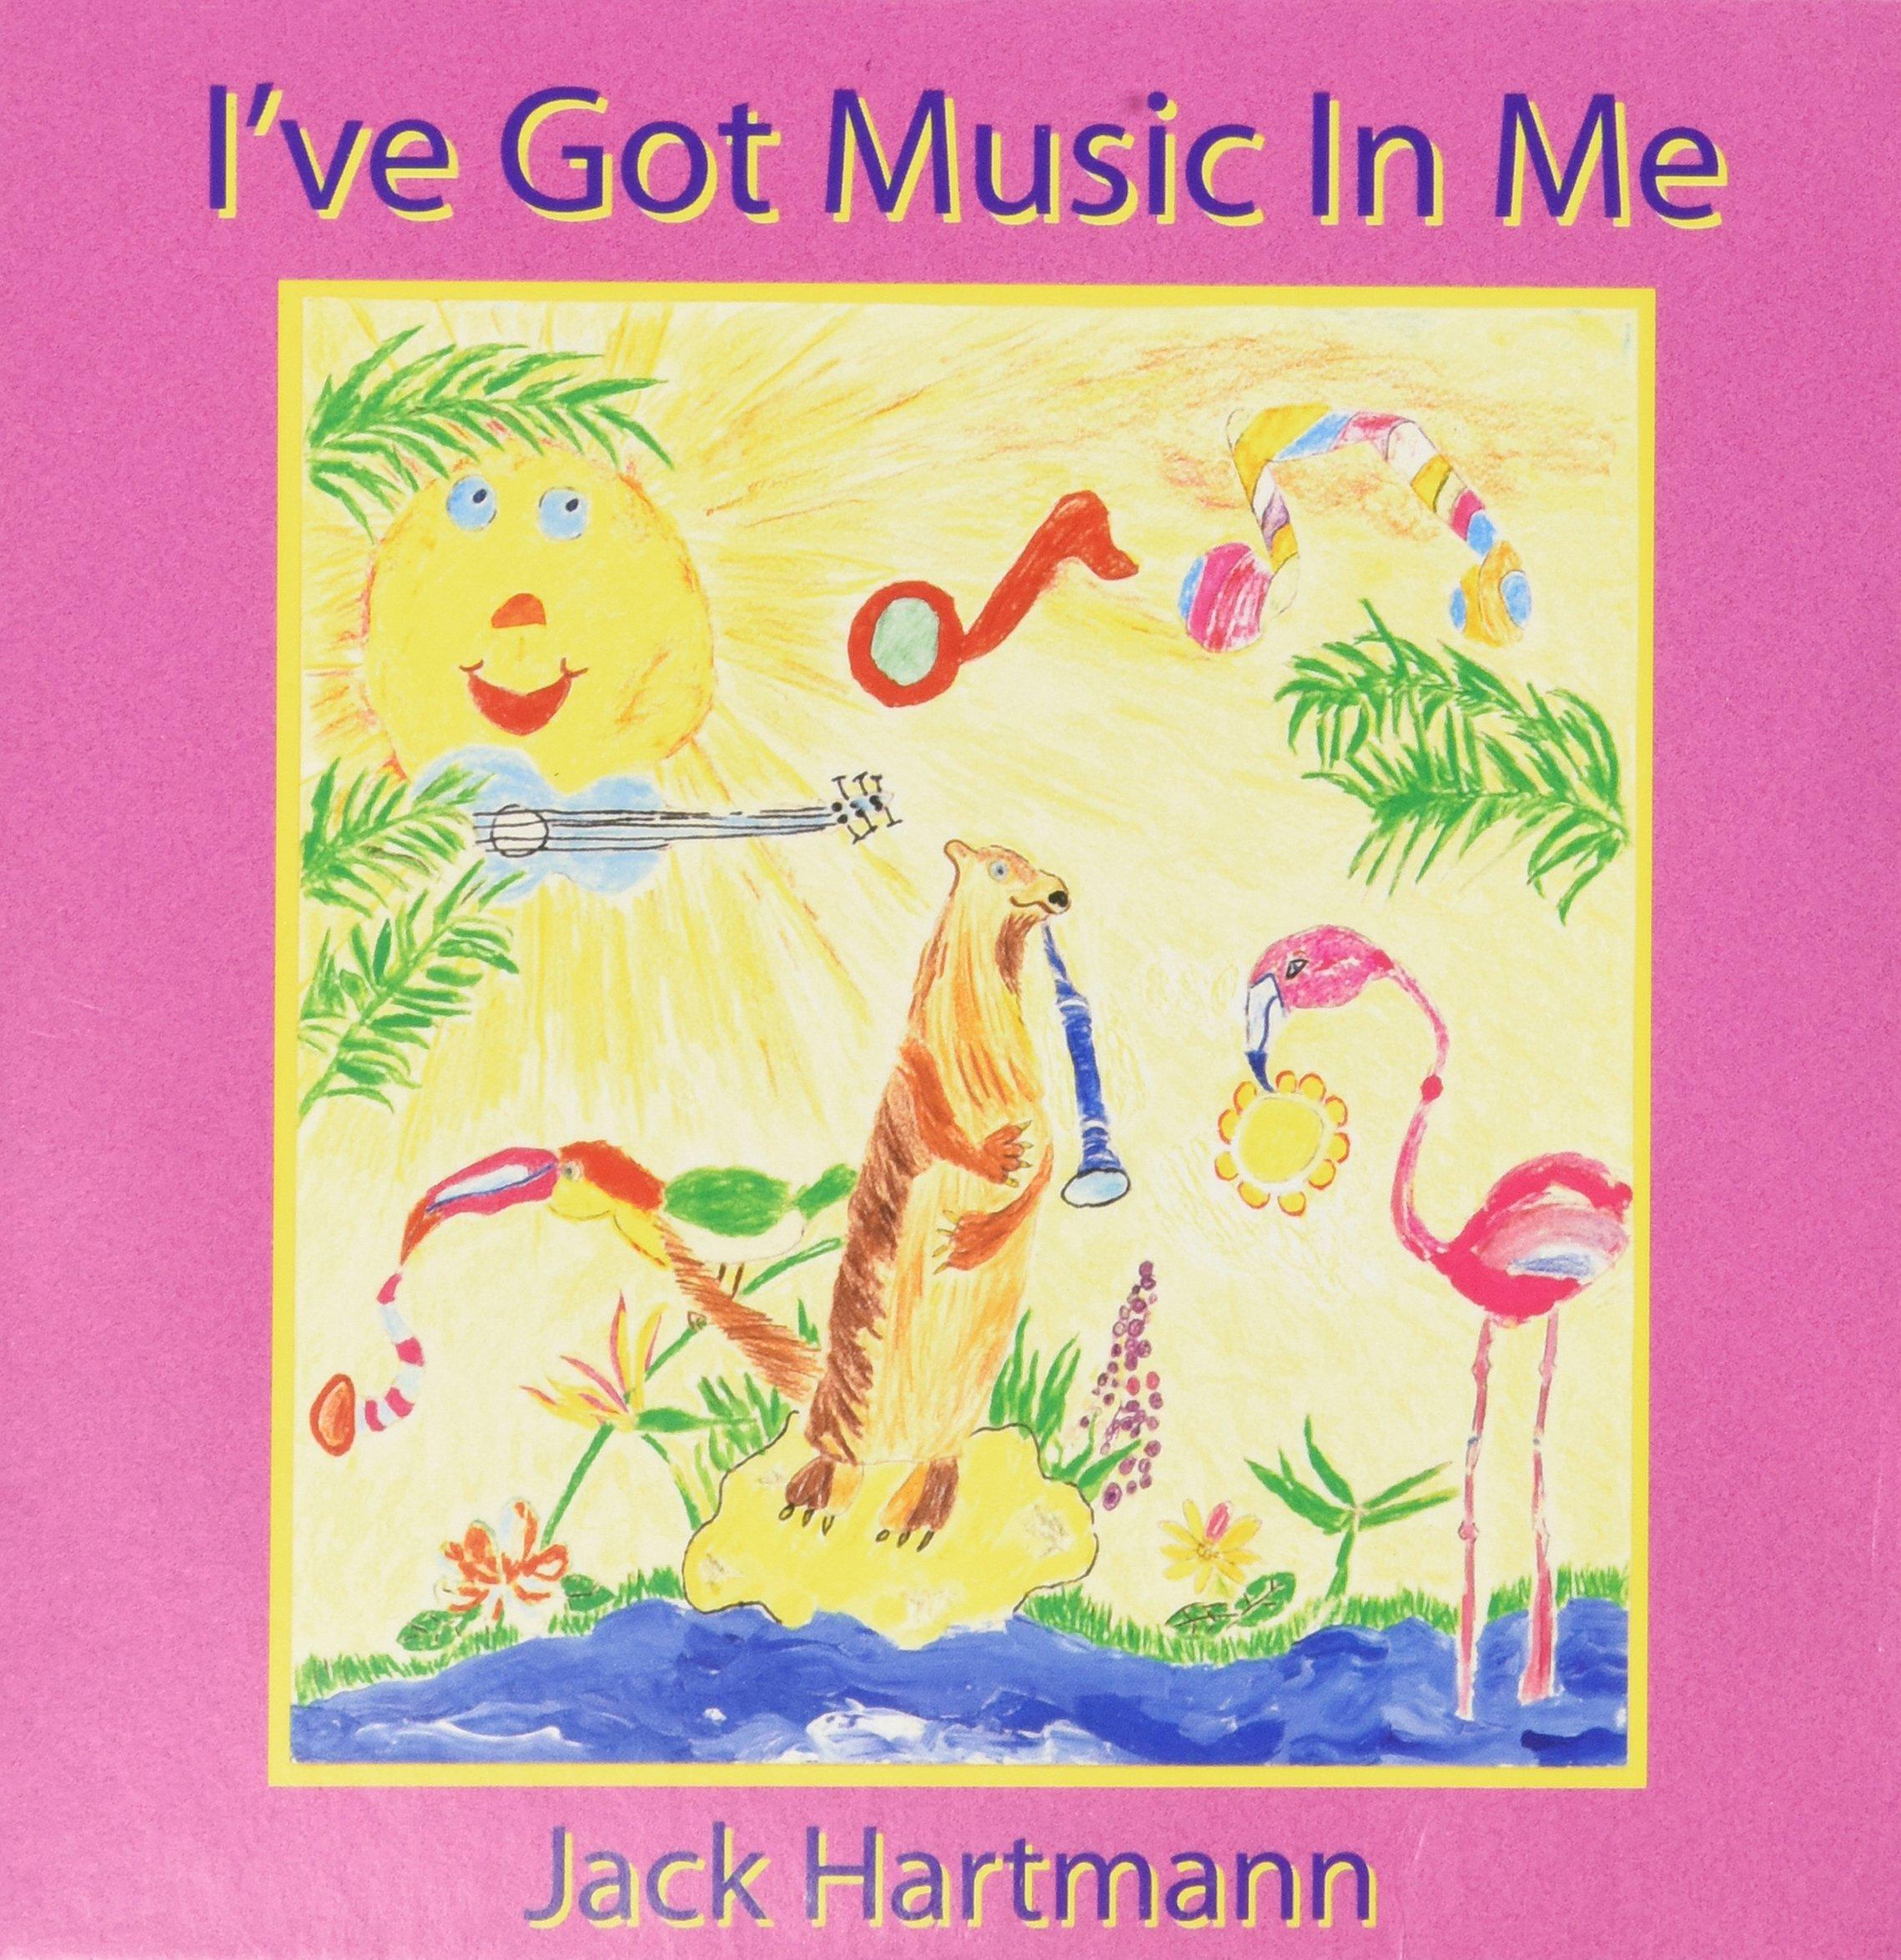 I've Got Music in Me by Cd Baby